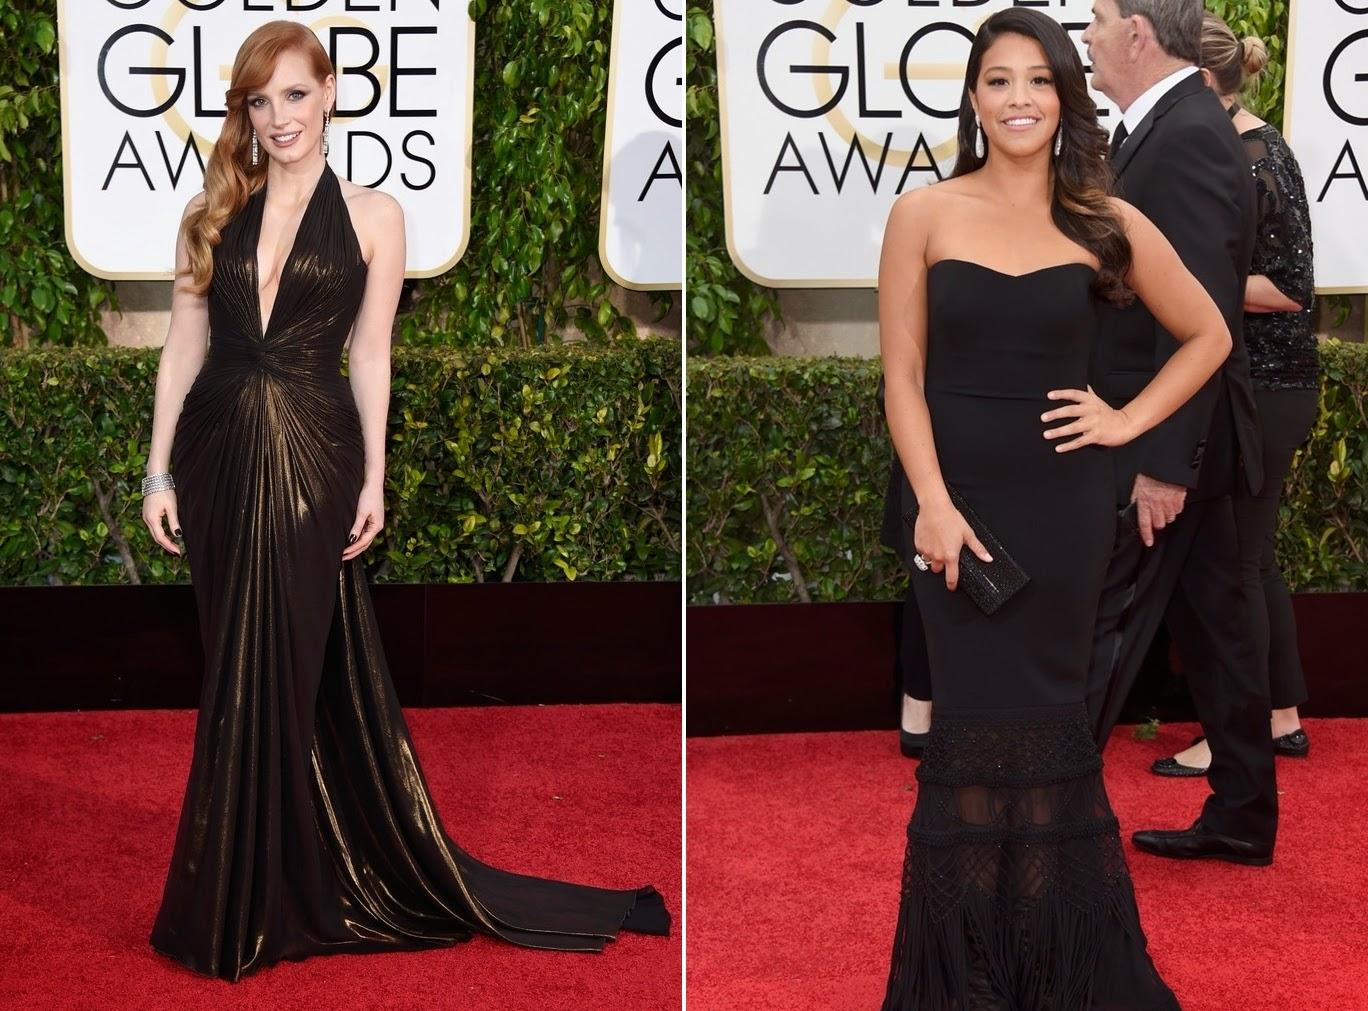 Os looks do Globo de Ouro 2015